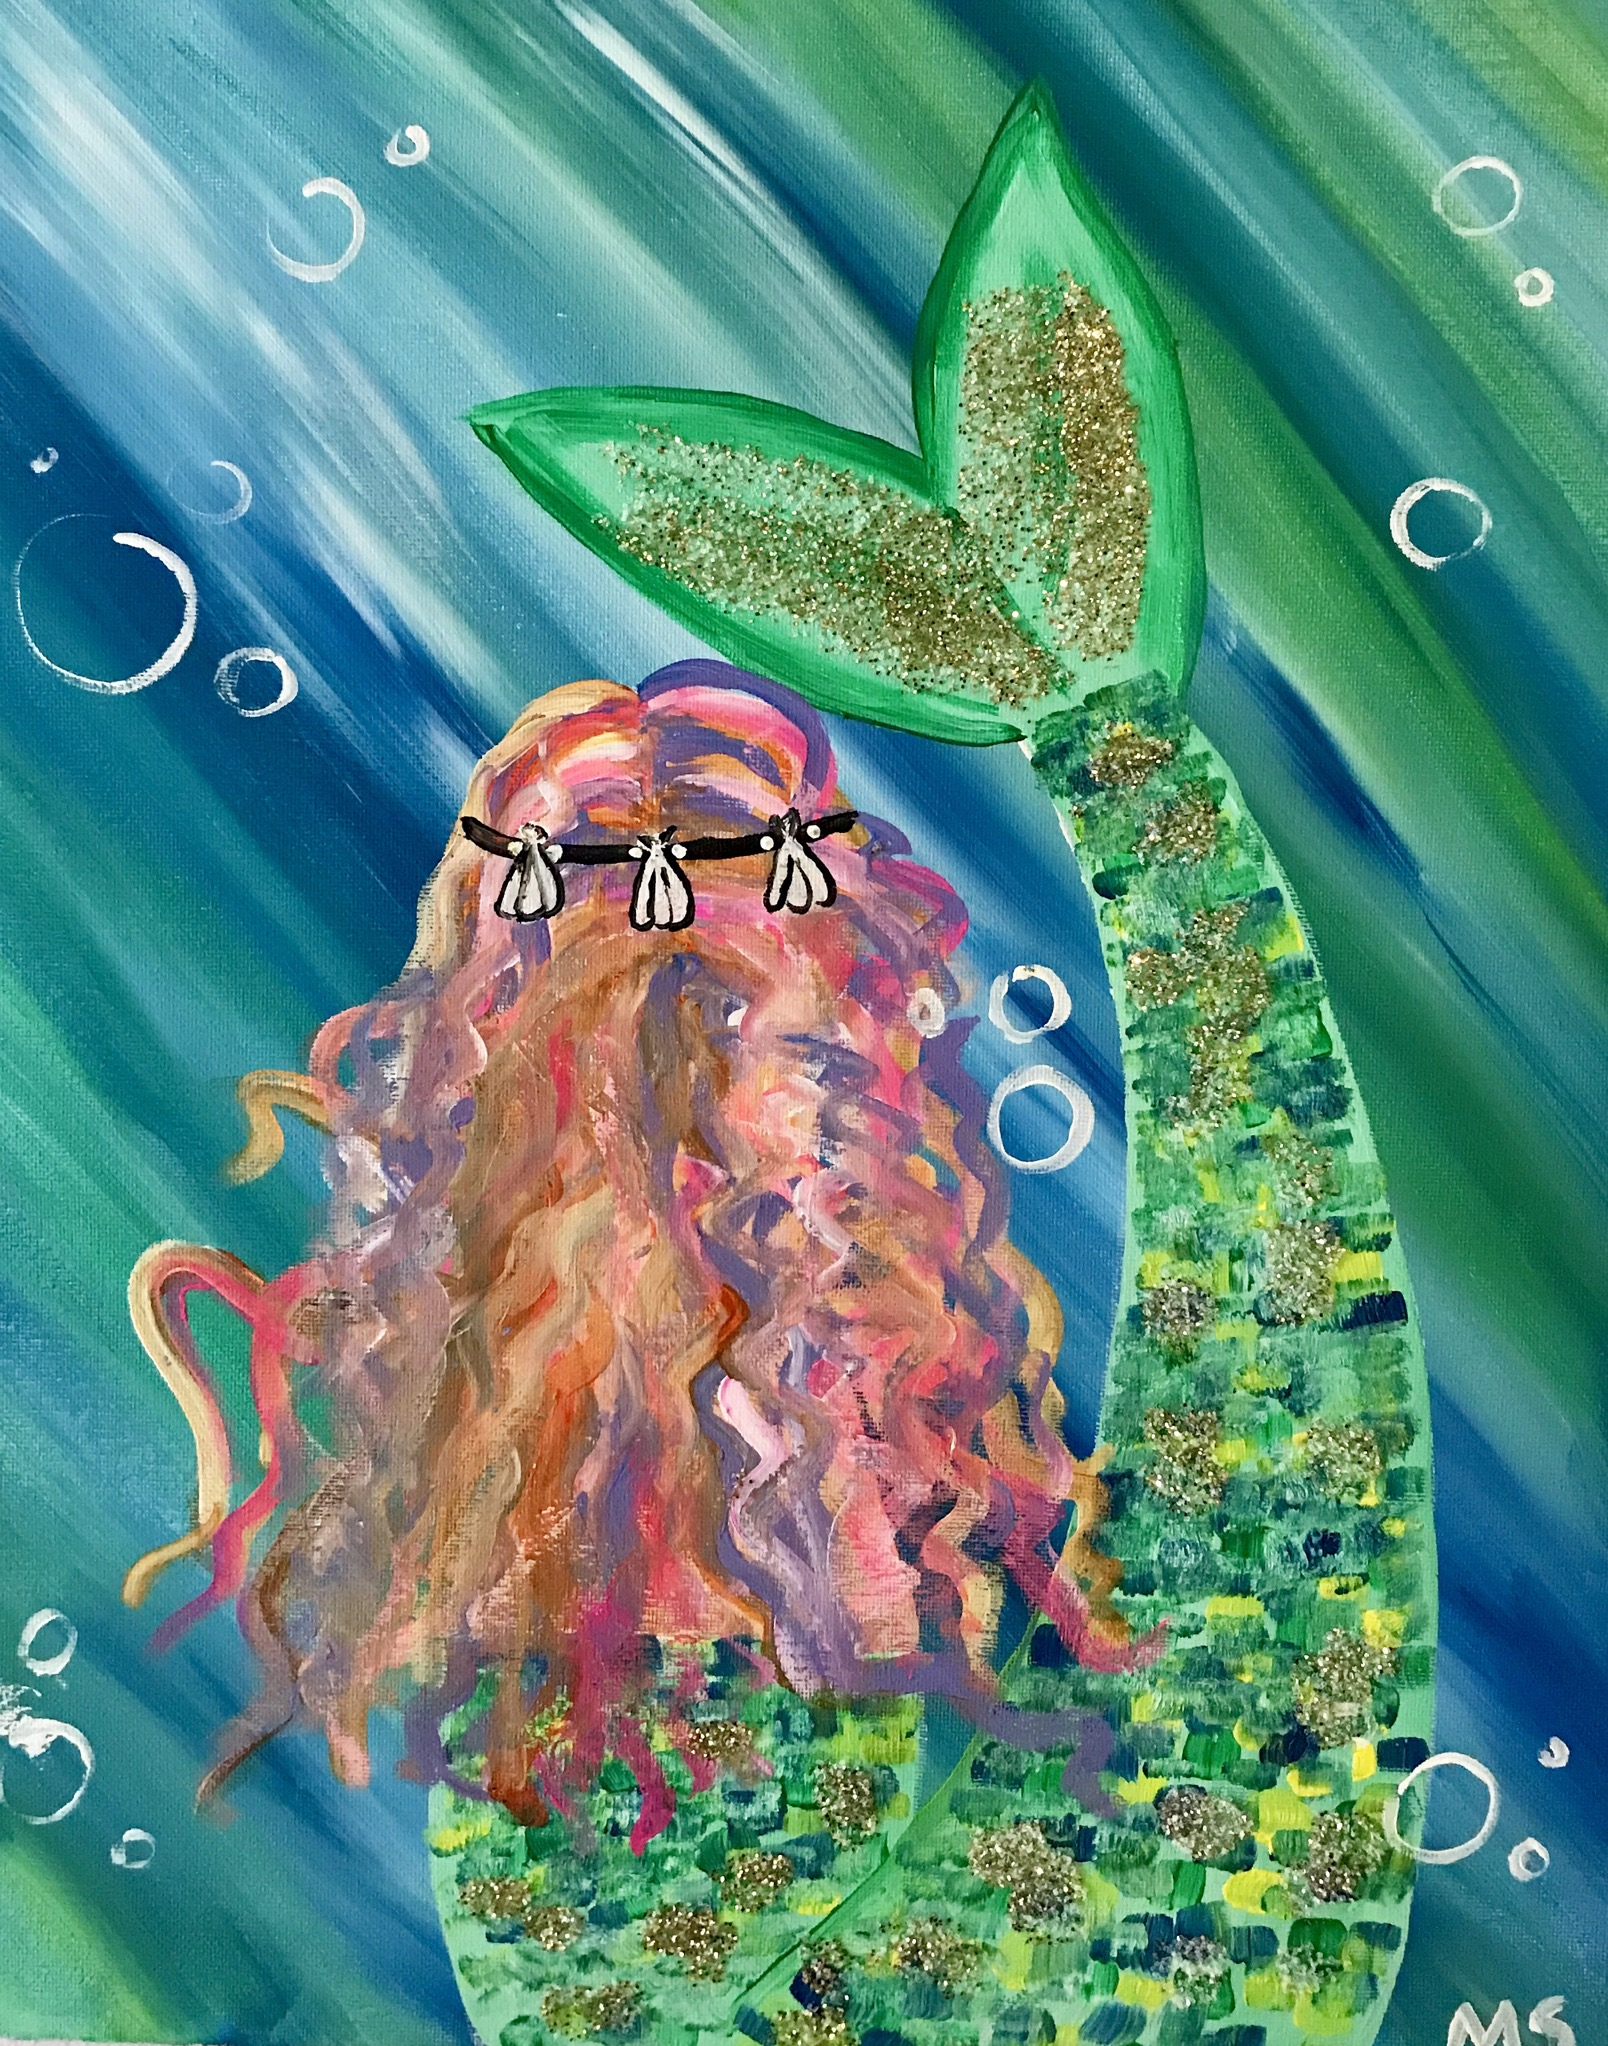 Mermaid- Family Friendly